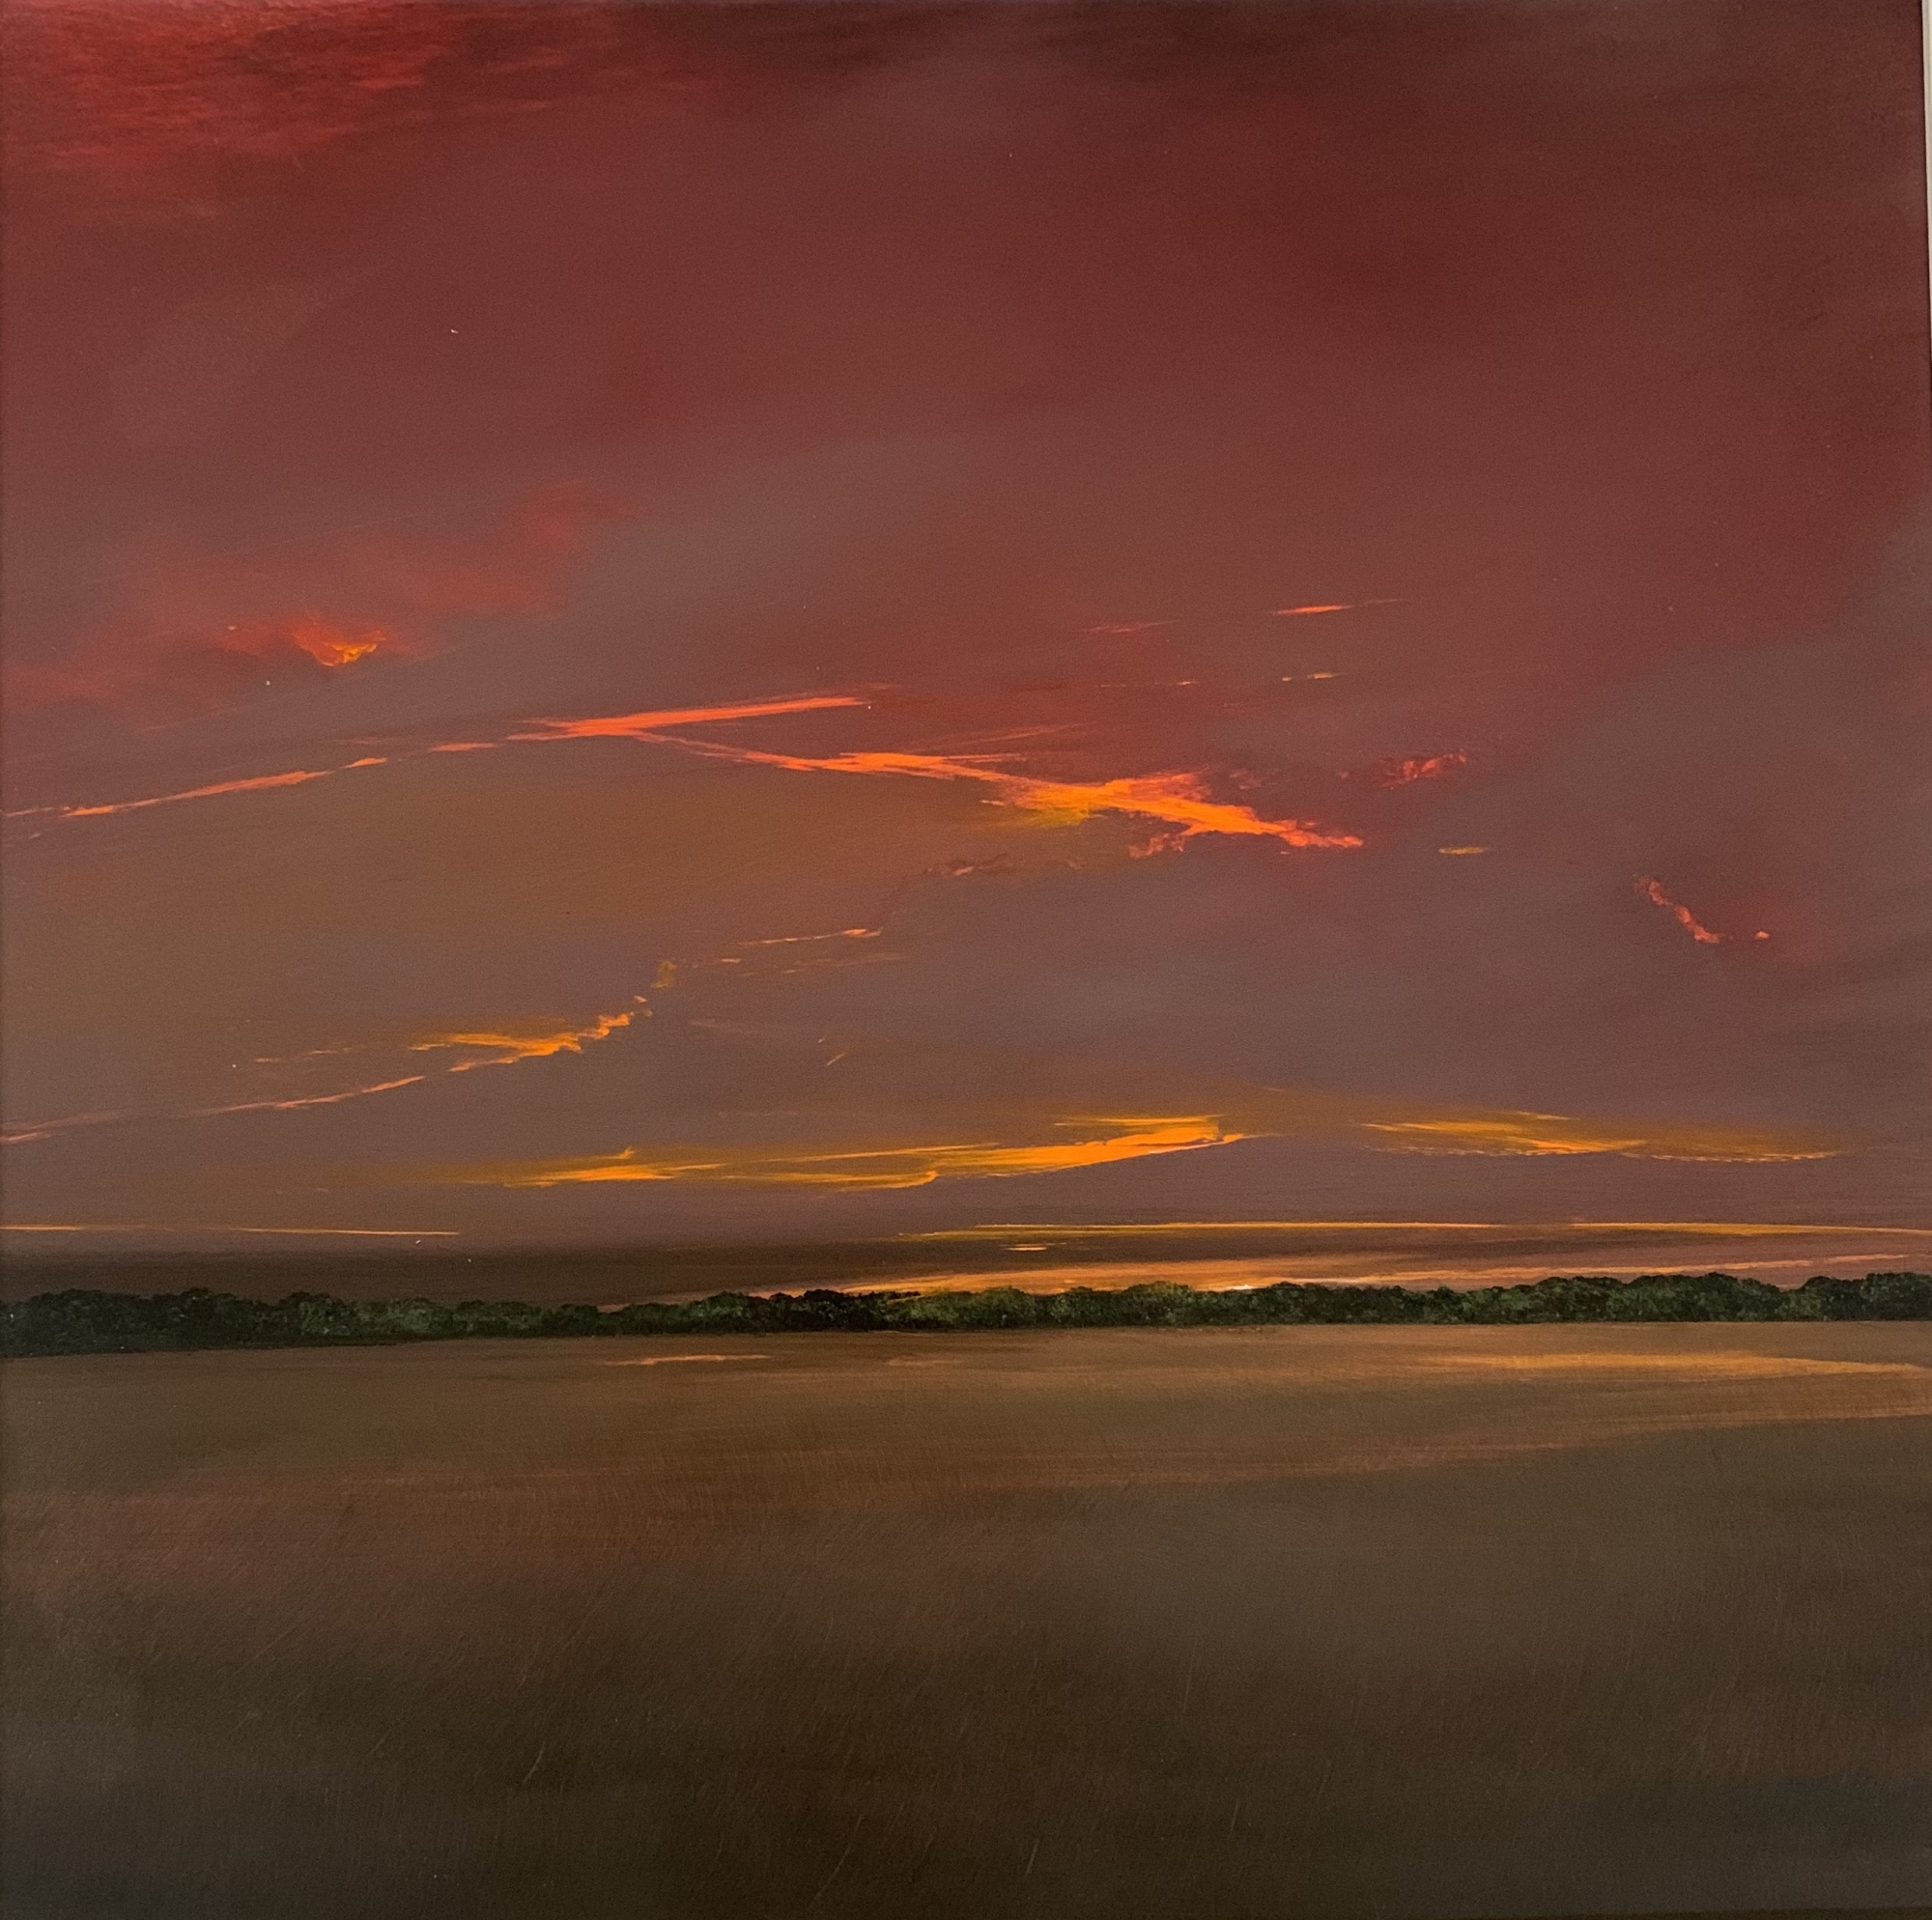 Abstract Landscape #4 by Scott Steele